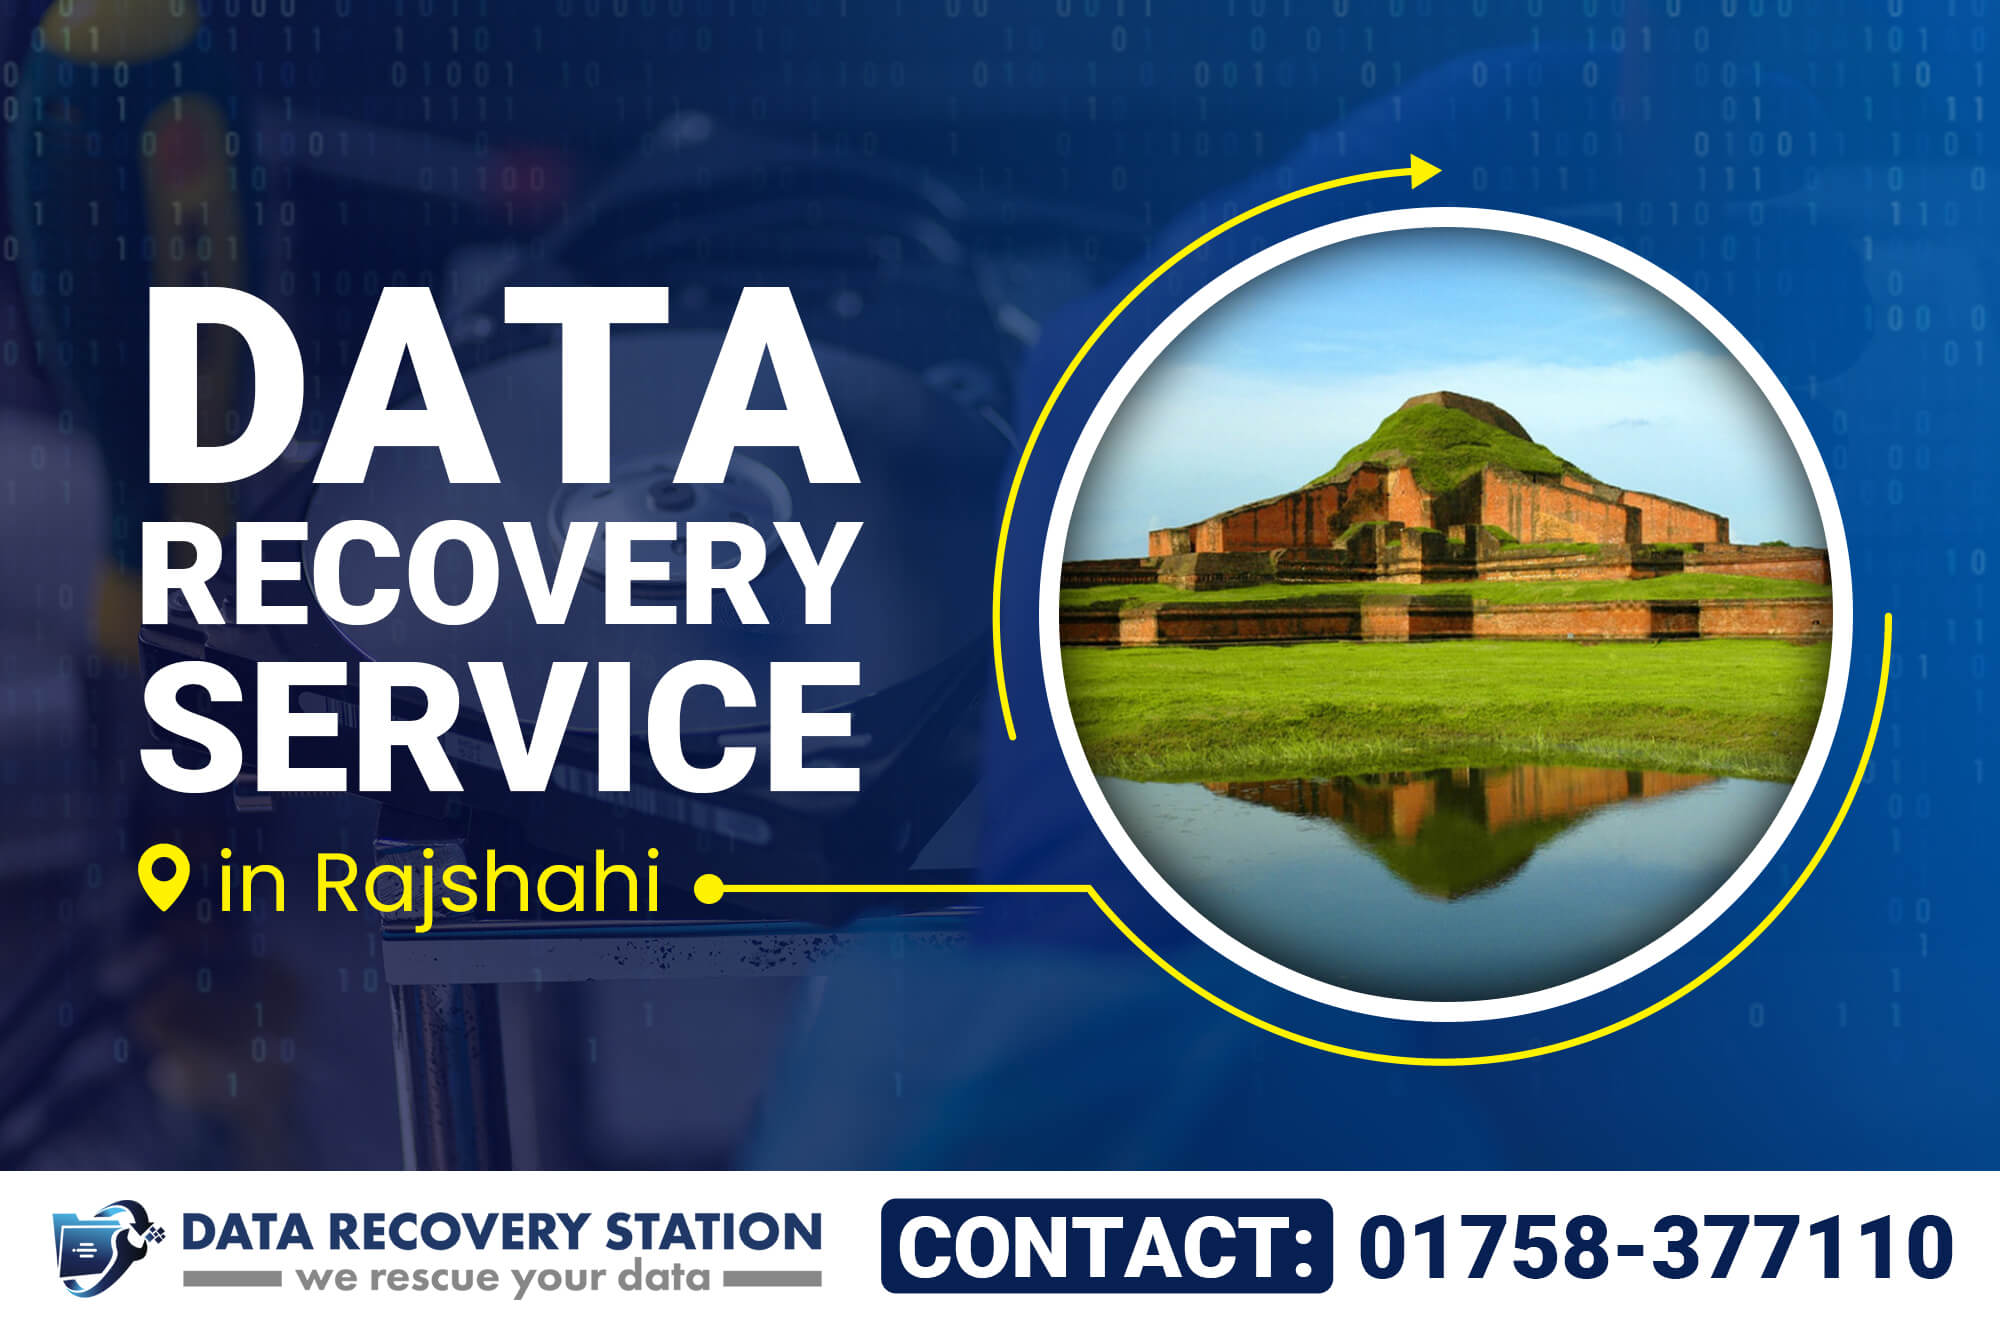 Data Recovery Service in Rajshahi